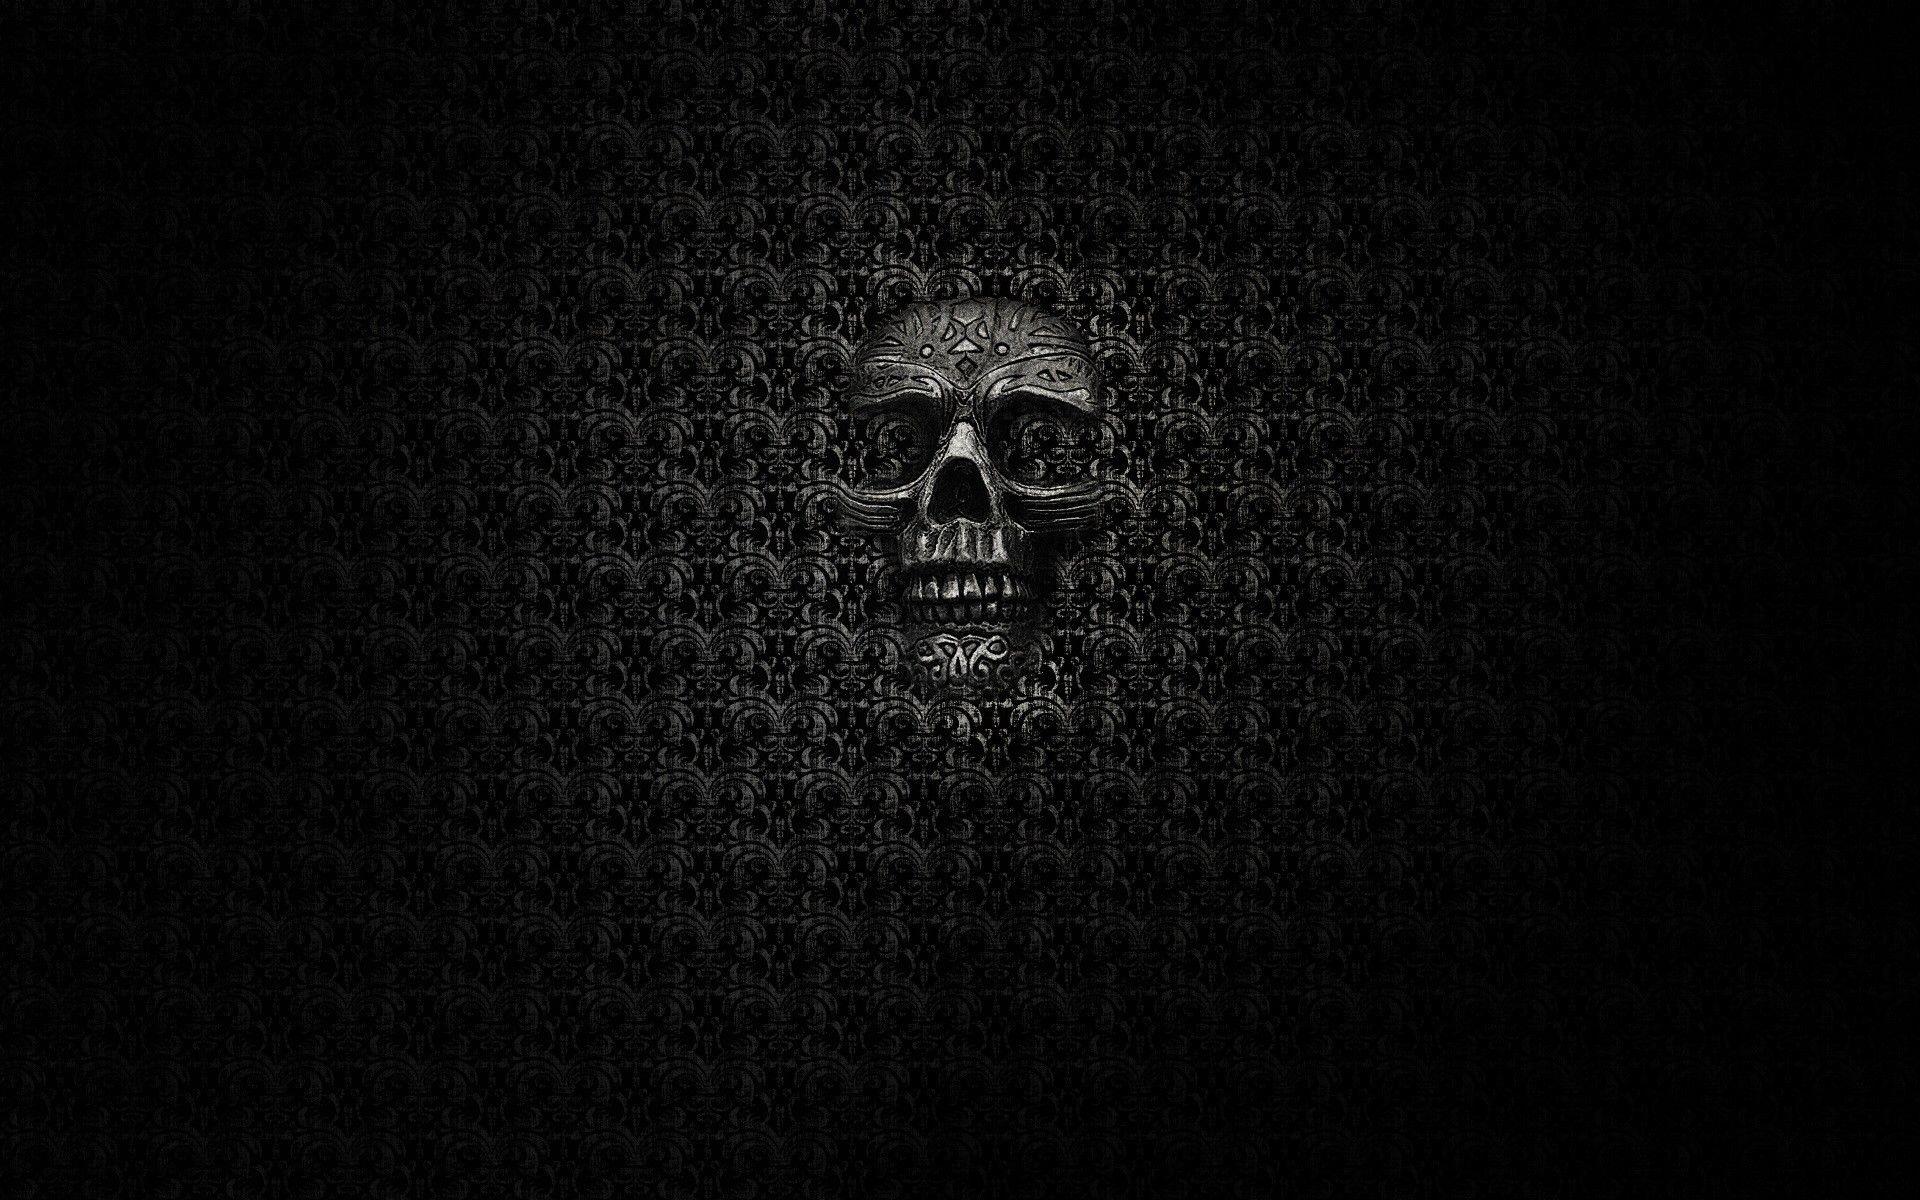 Black Skull Wallpaper Hd Iphone